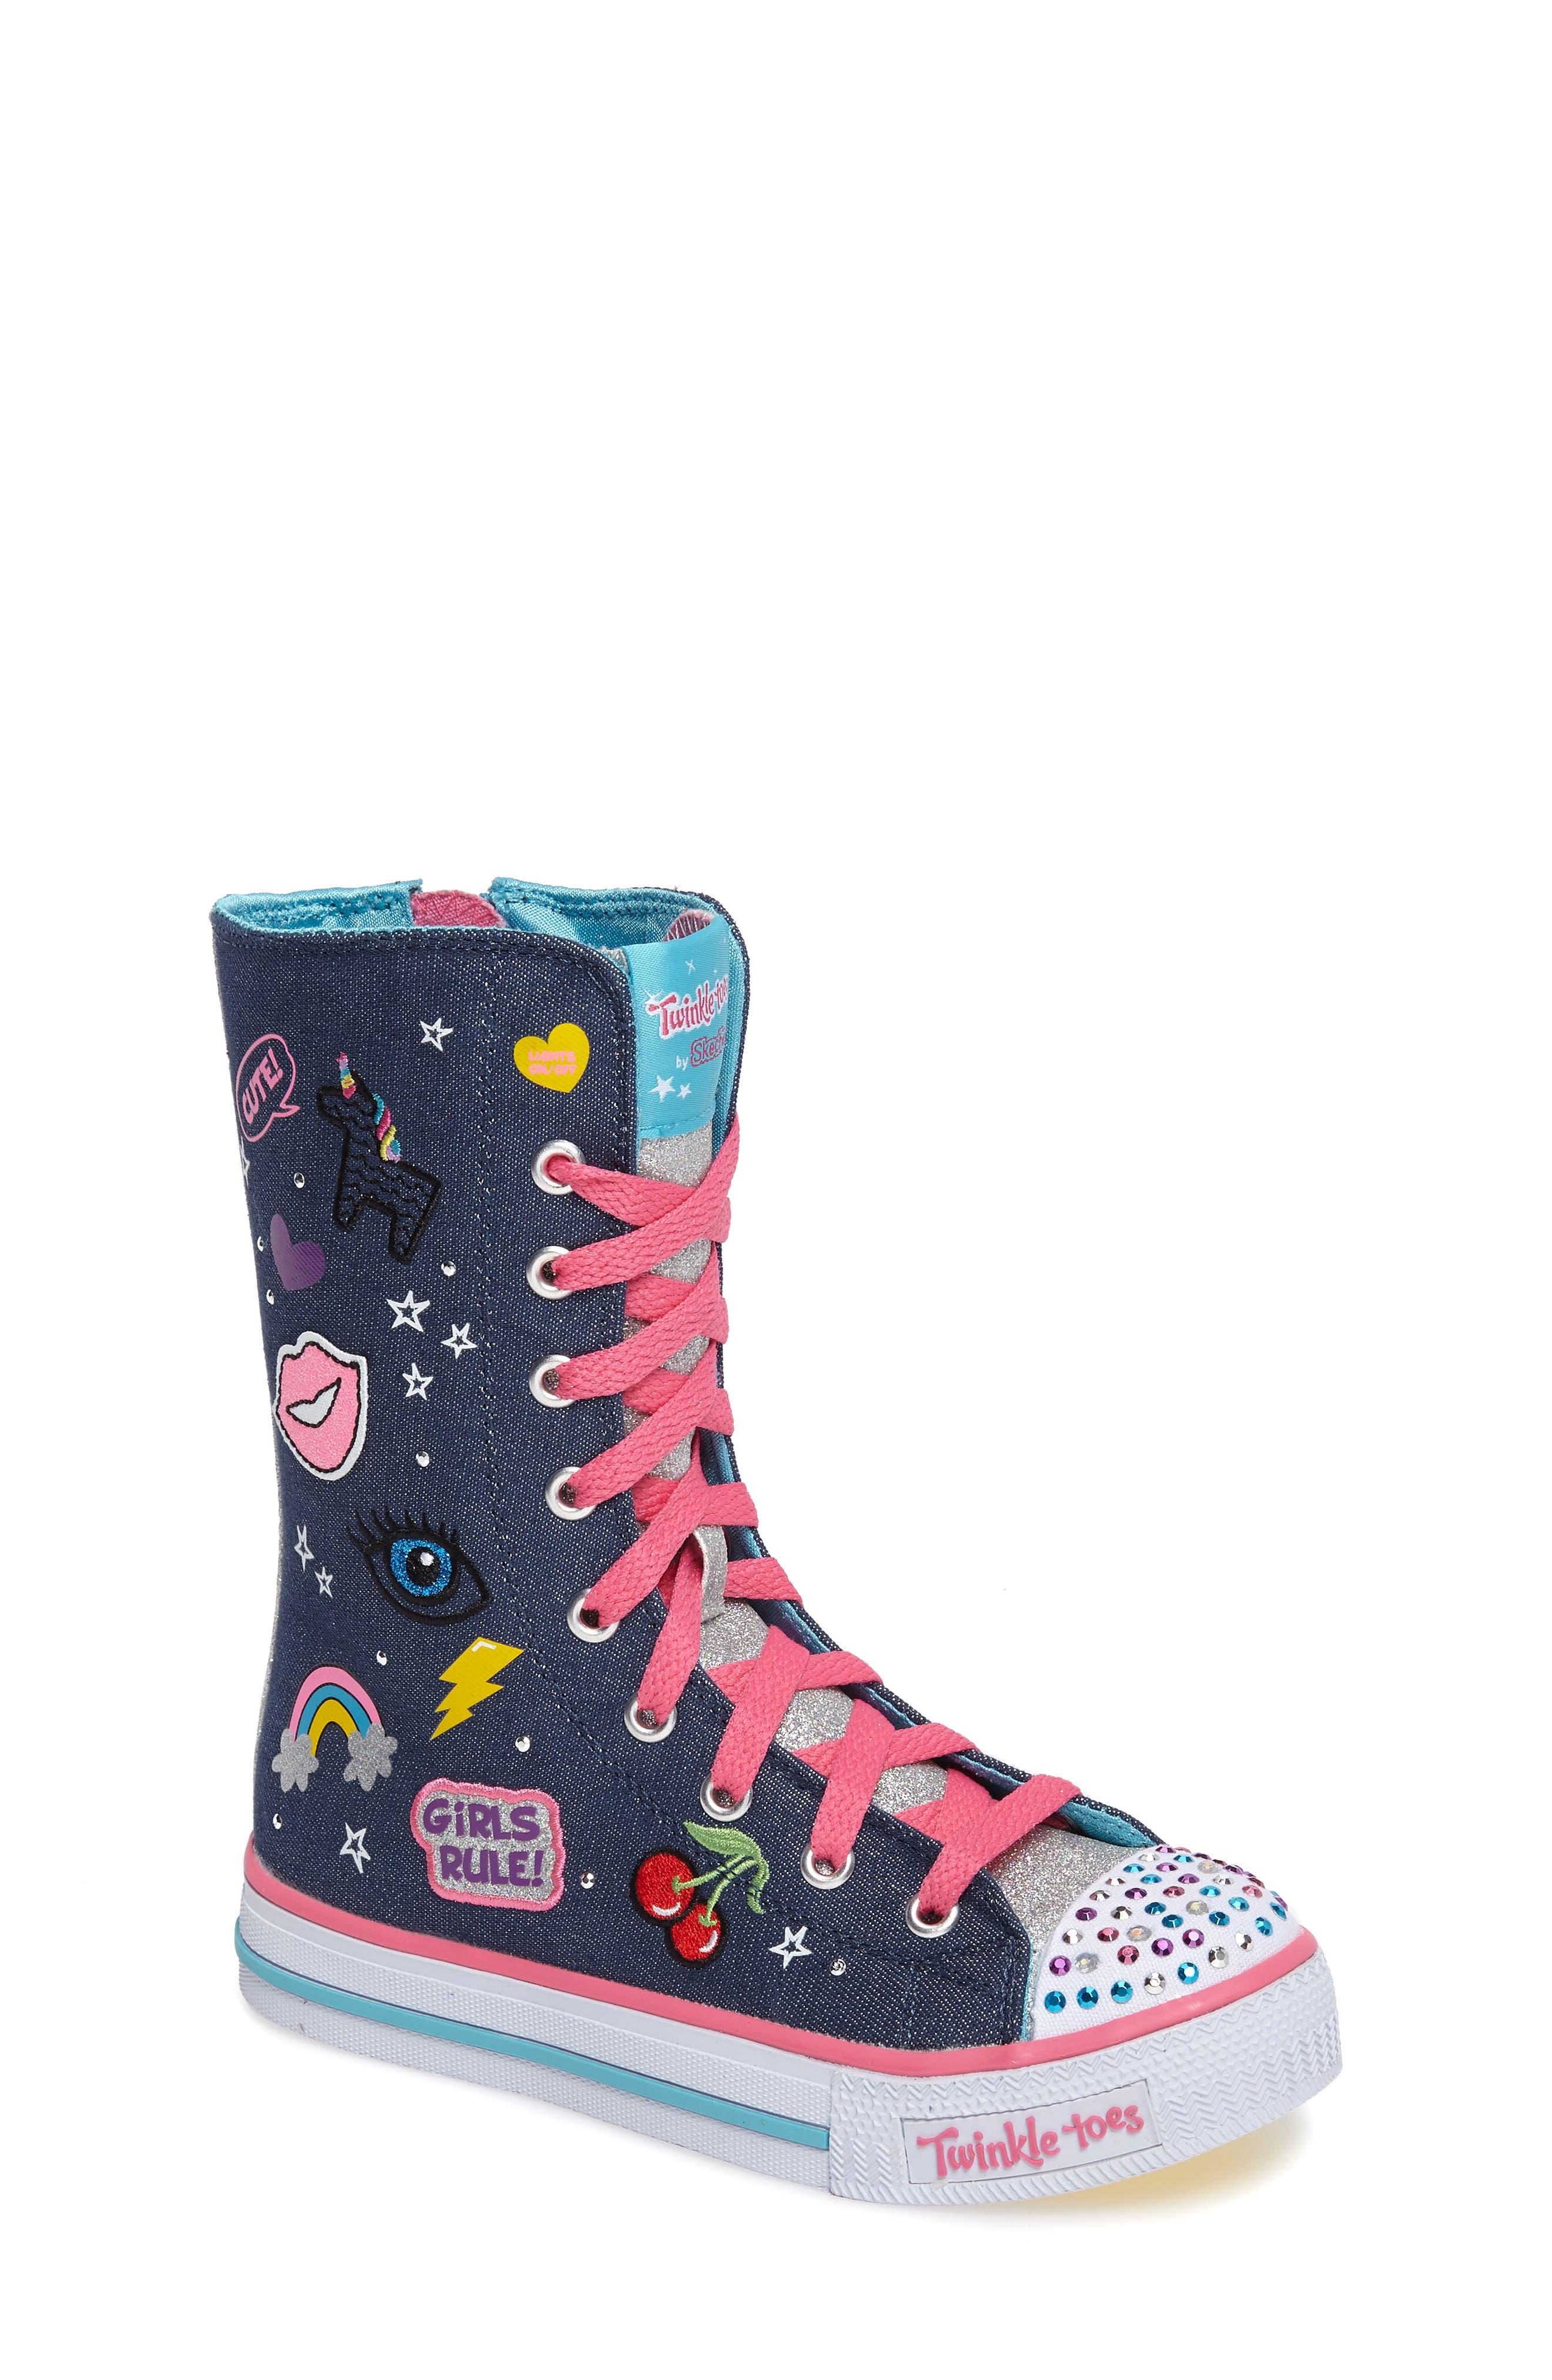 Twinkle Toes Shuffles Ultra High Top Sneaker,                         Main,                         color, Denim/ Multi